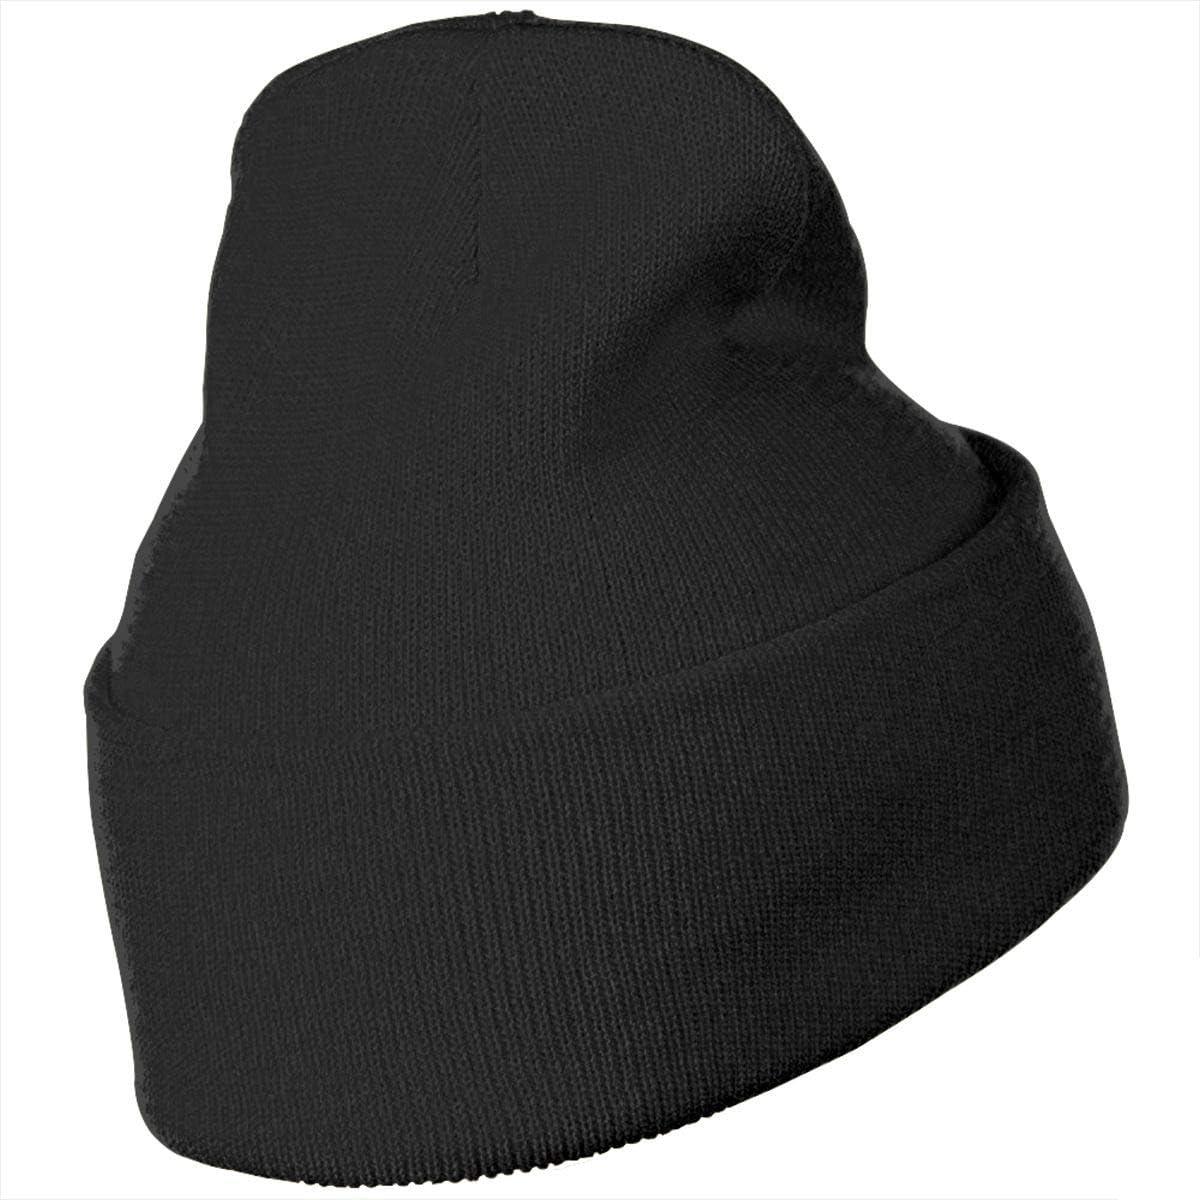 Unisex Winter Hats Jake Paul Its Every Day Van Gogh Skull Caps Knit Hat Cap Beanie Cap for Men//Womens